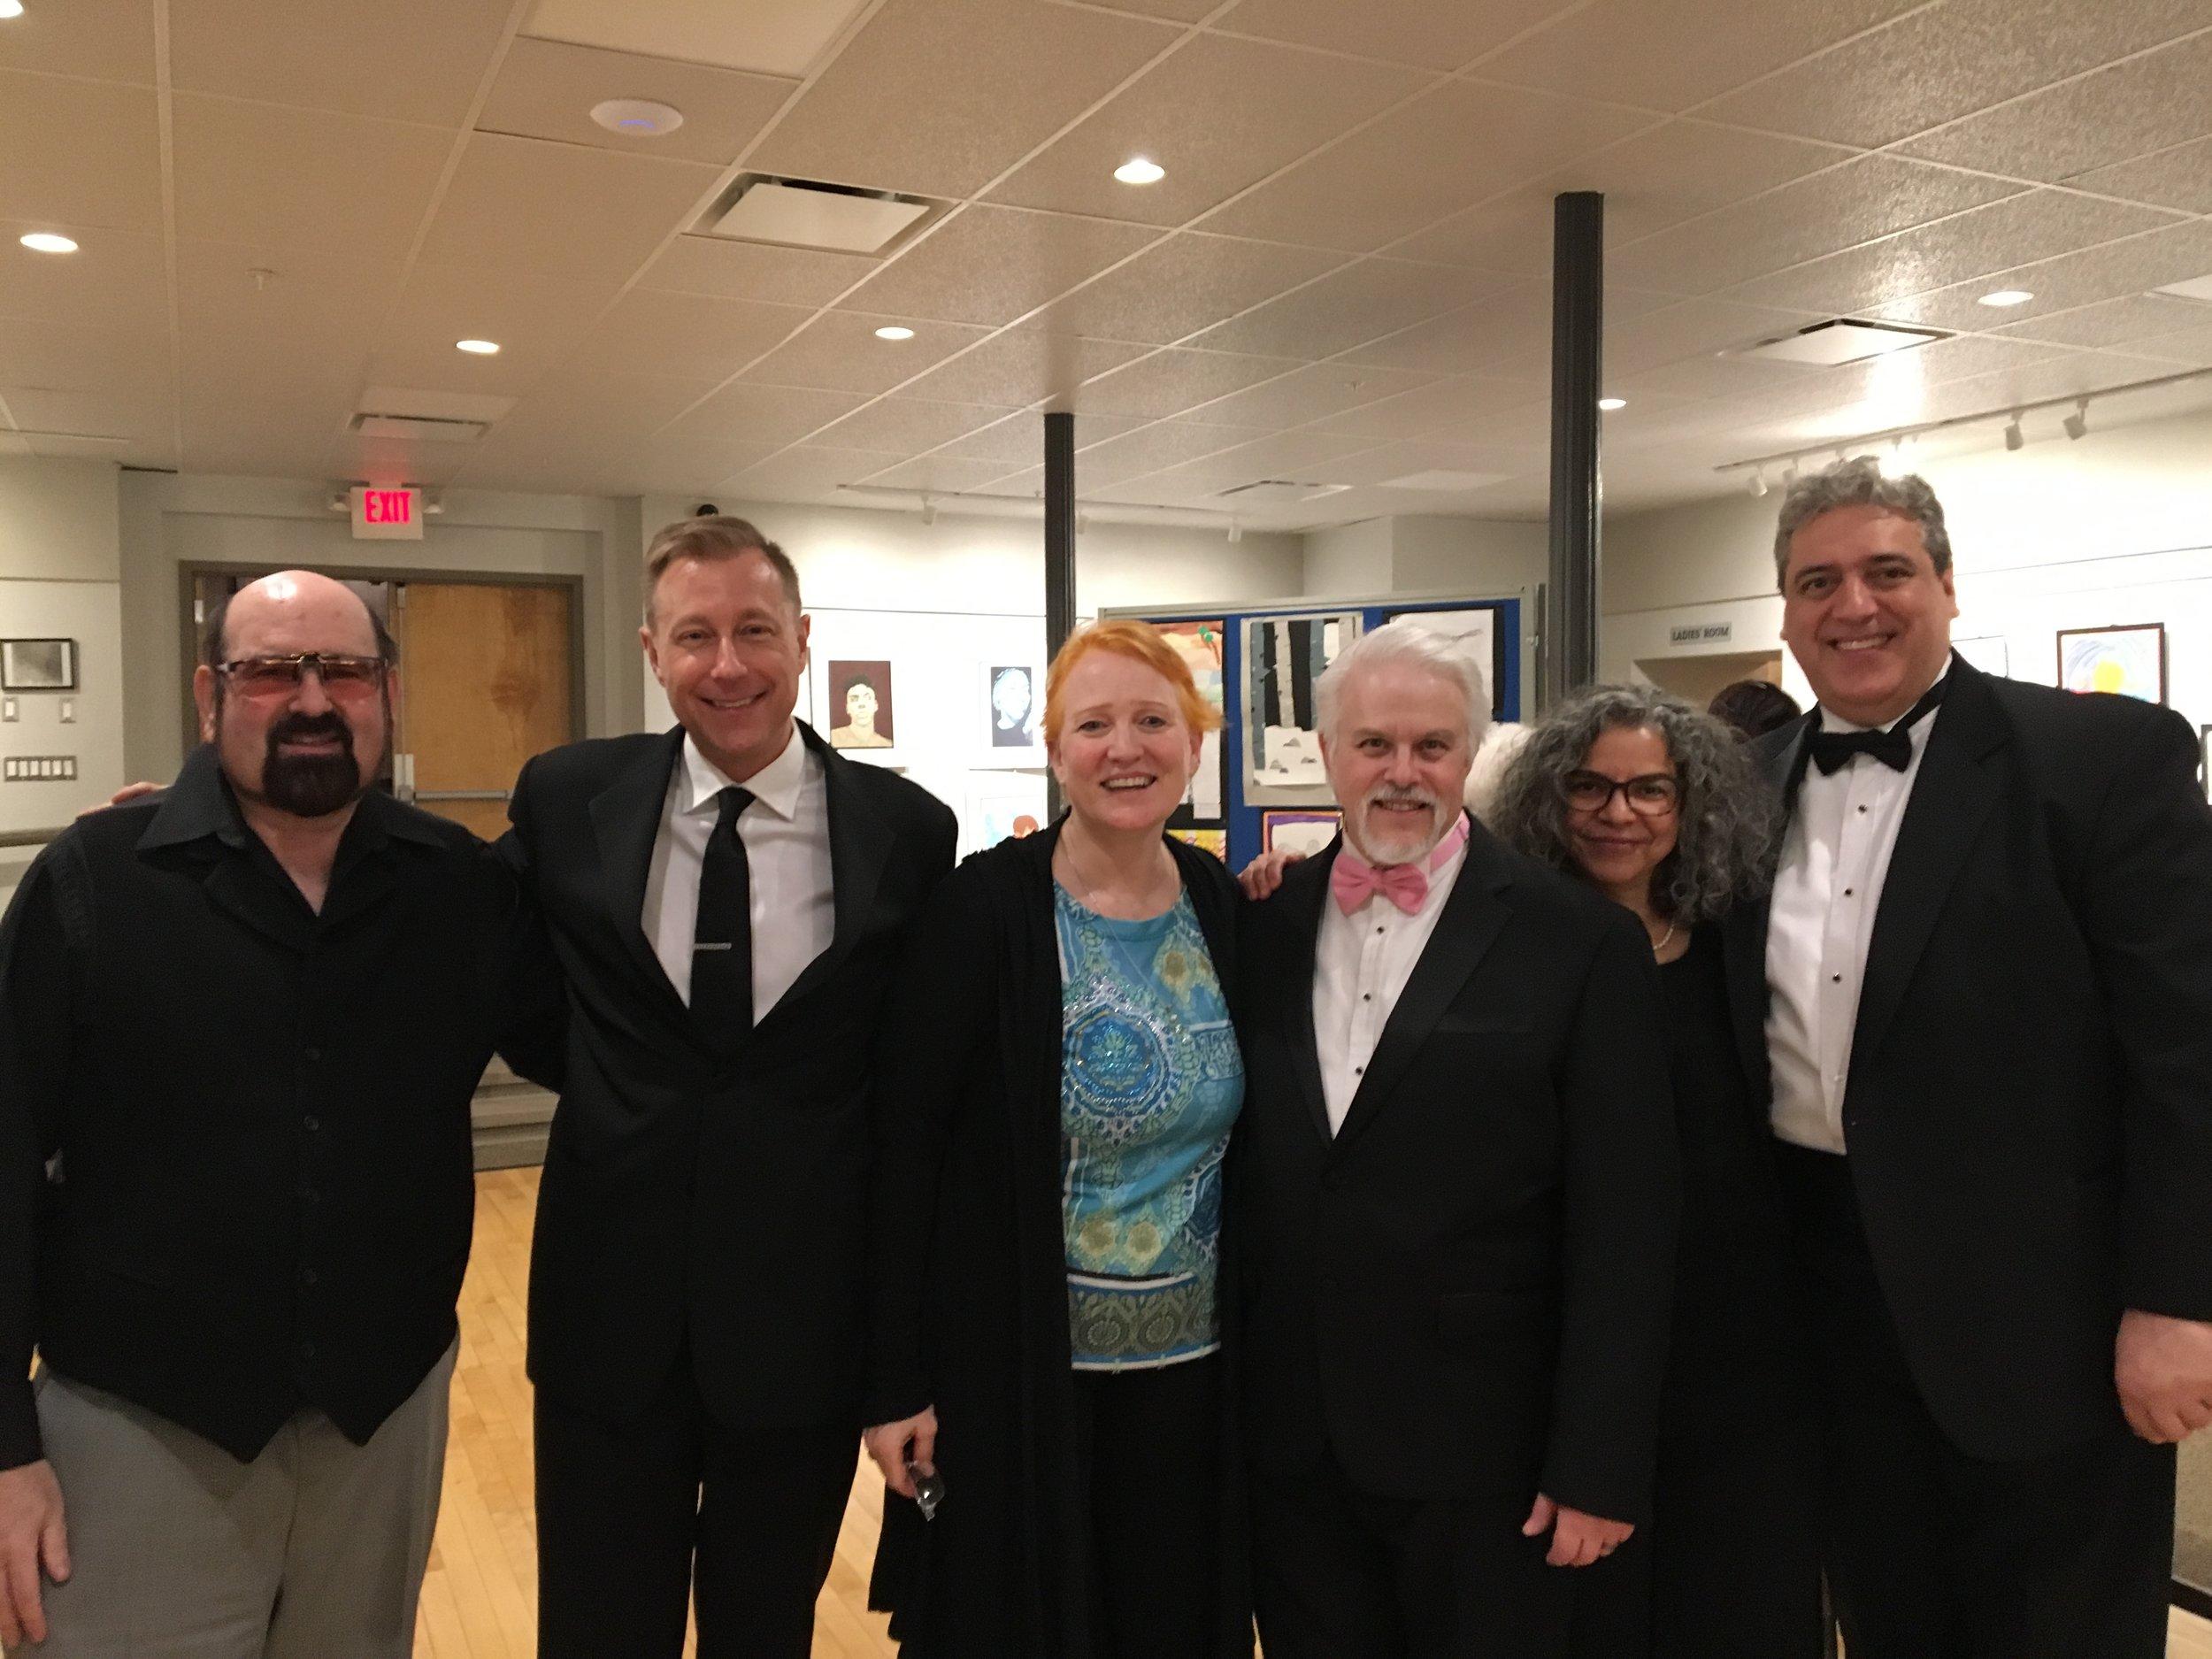 PV with composer Jeffrey Kaufman, Frank Basile & Marisol Espada